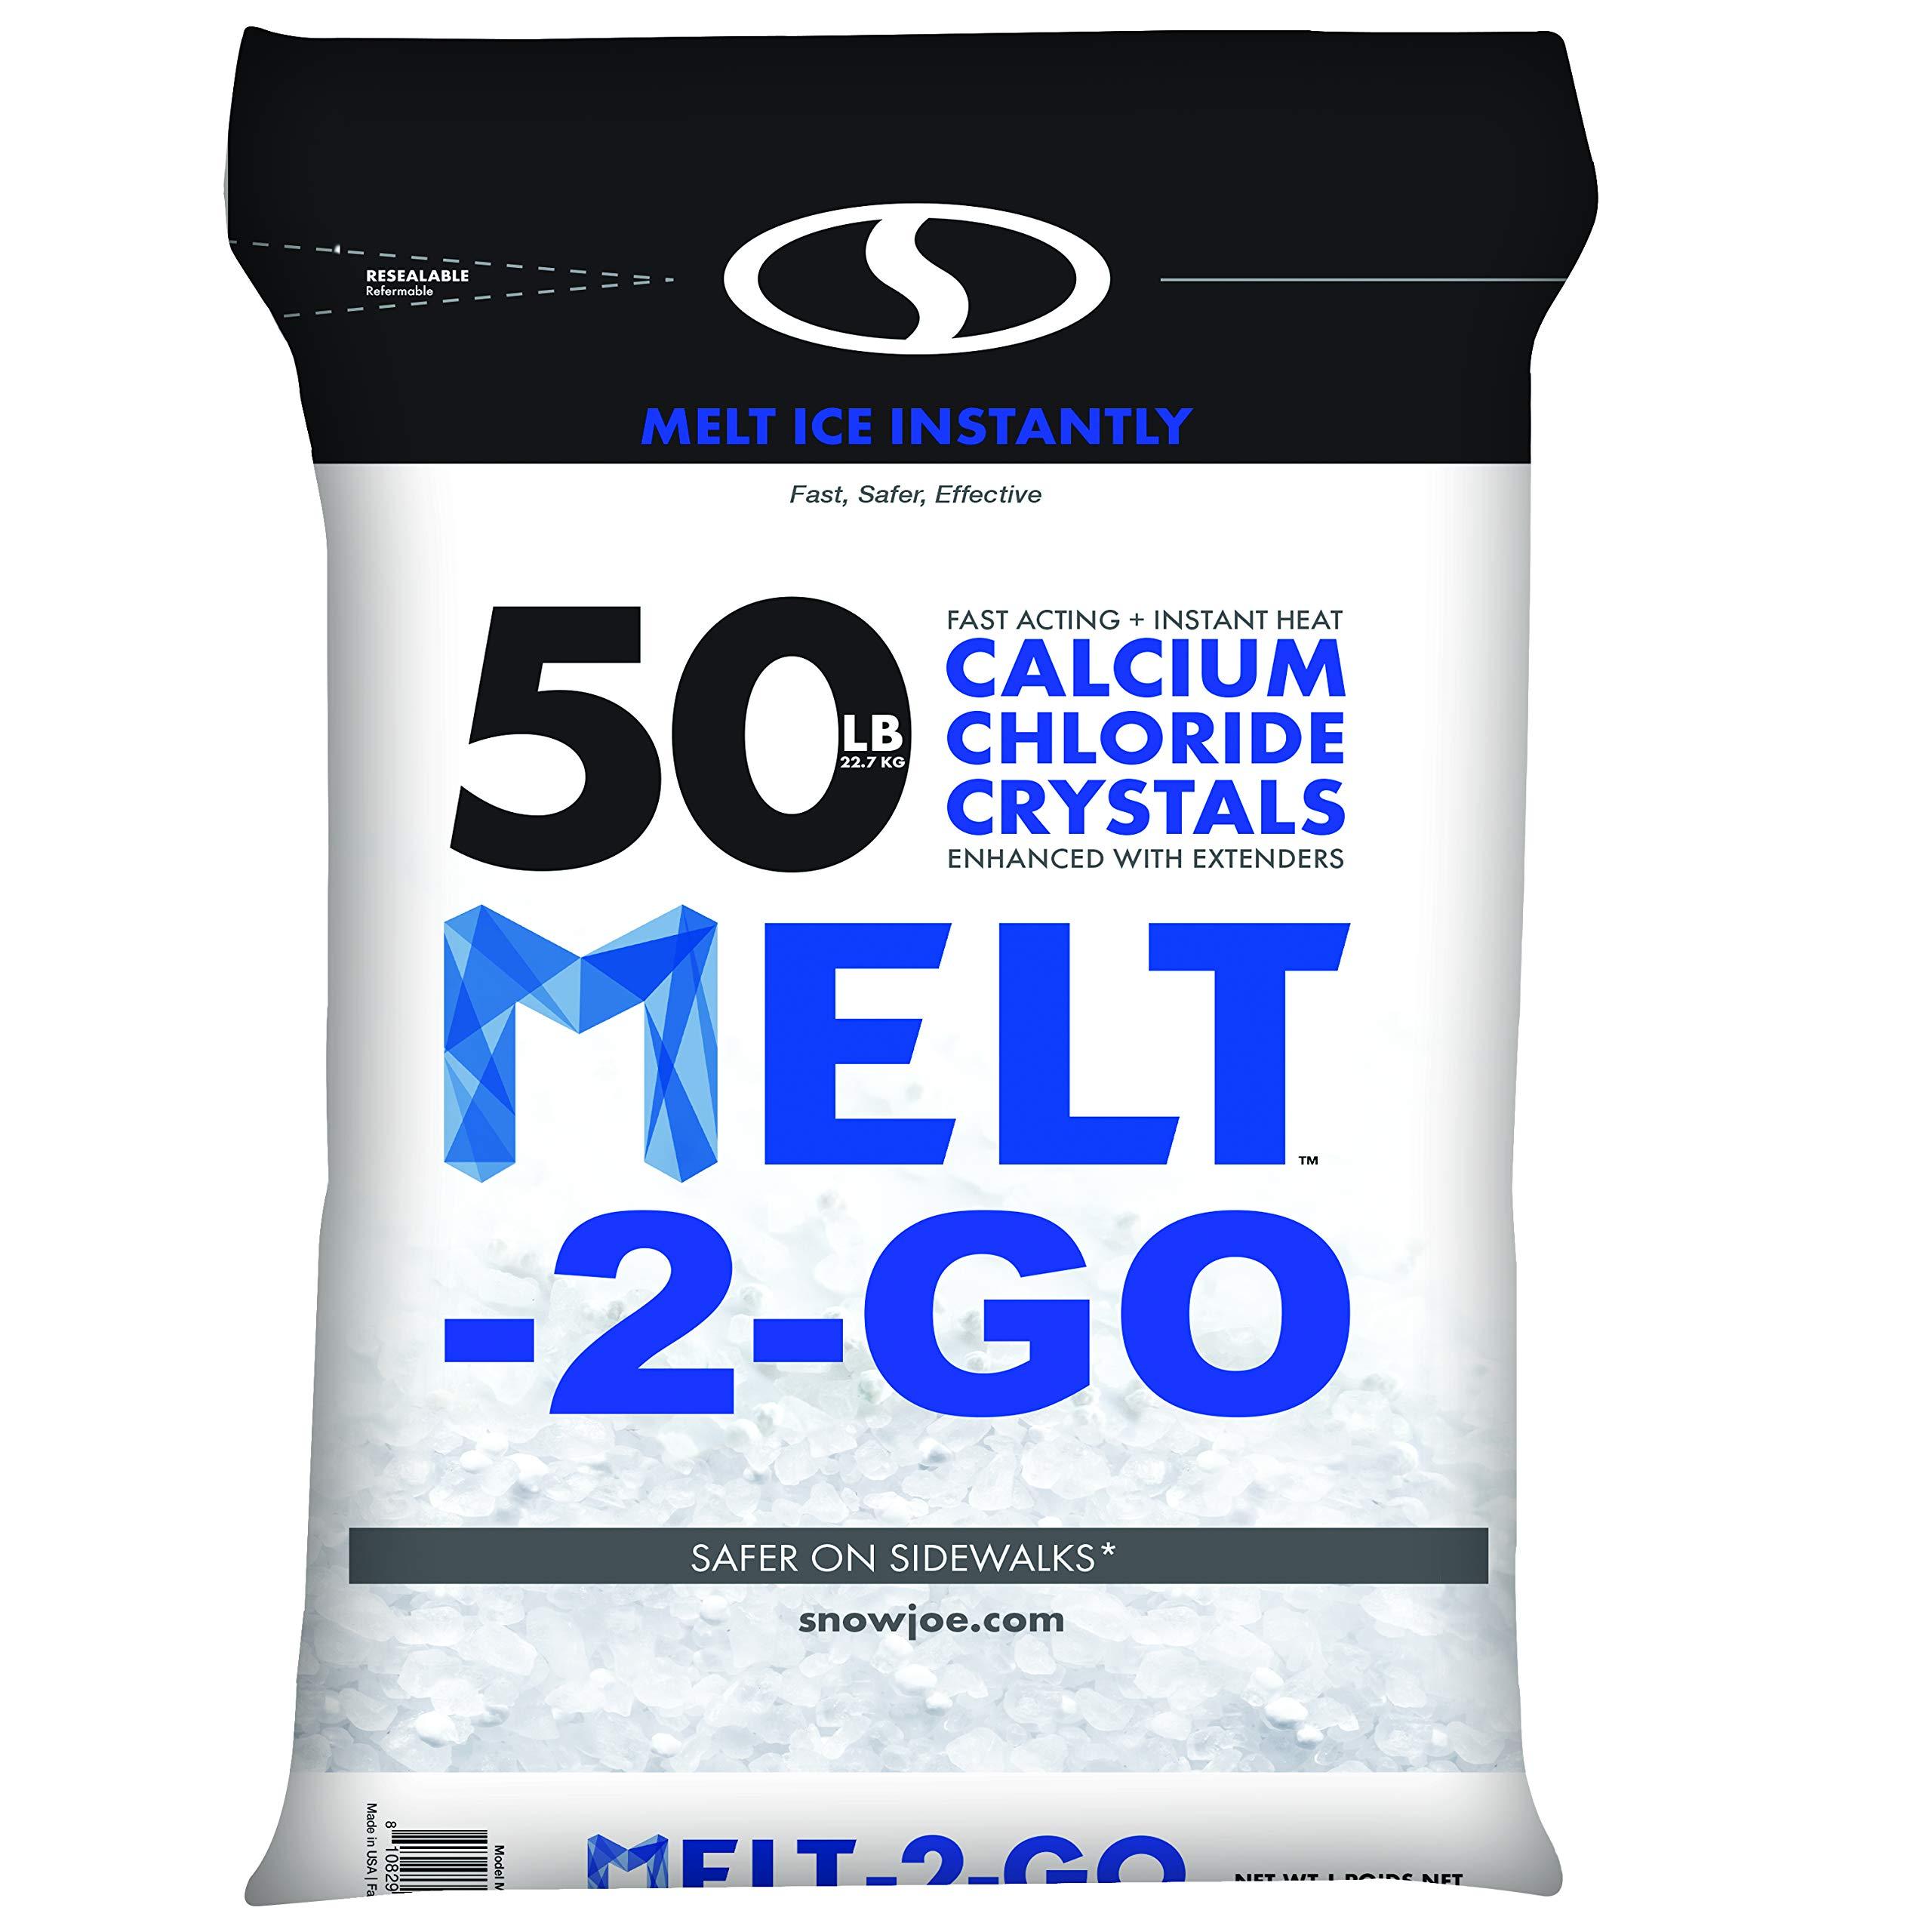 Snow Joe AZ-50-CC Melt-2-Go Resealable Bag Premium Calcium Chloride Crystal Ice Melter, 50 lb by Snow Joe